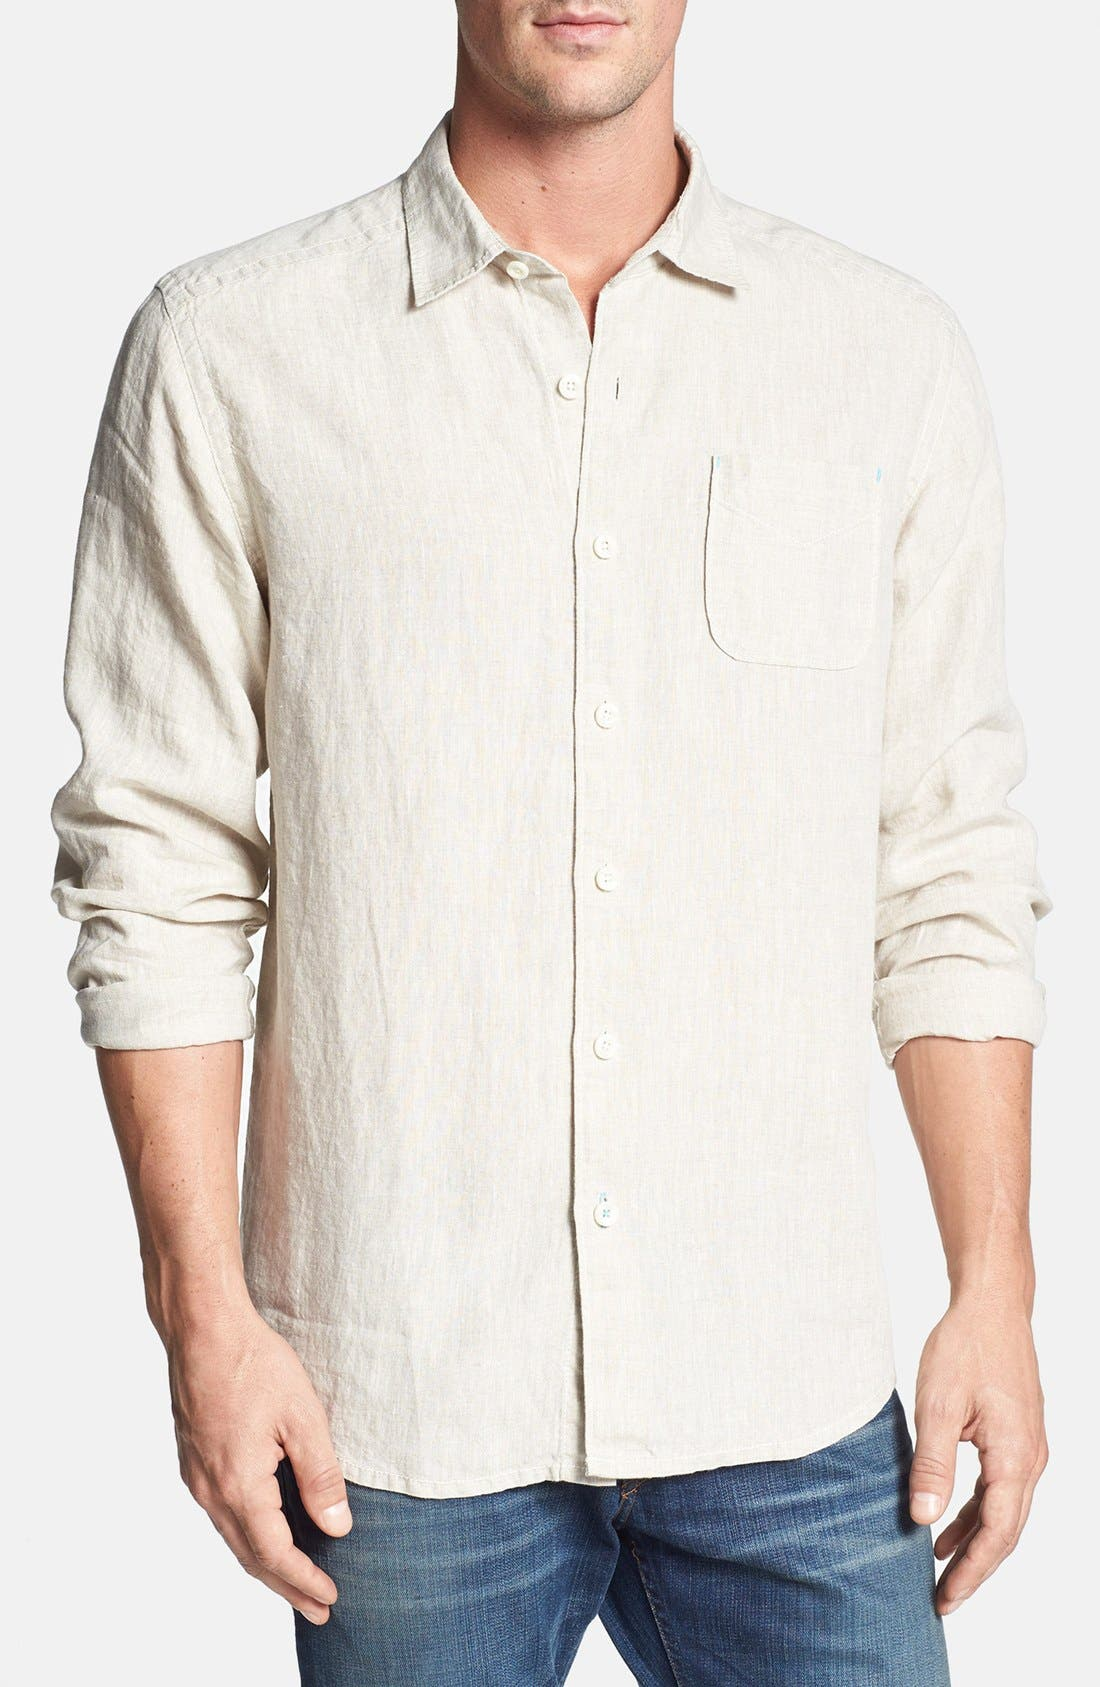 Alternate Image 1 Selected - Tommy Bahama 'Sea Glass Breezer' Original Fit Sport Shirt